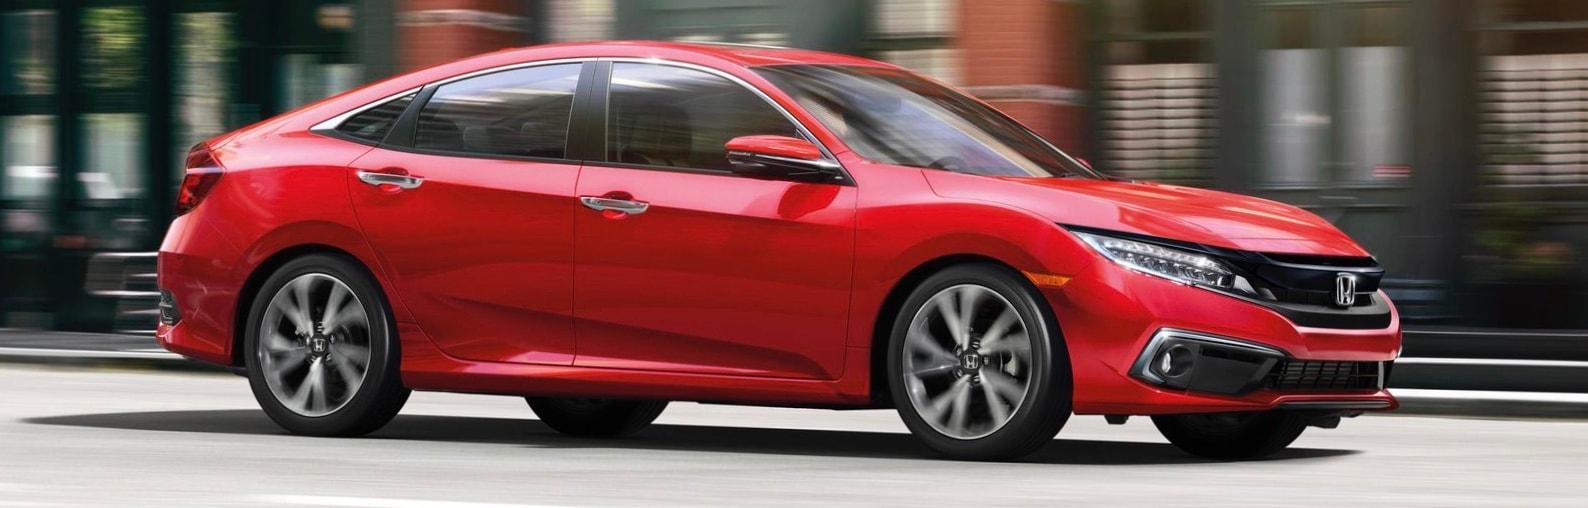 2019 Honda Civic Sport Review Stockton Honda New Used Honda Cars